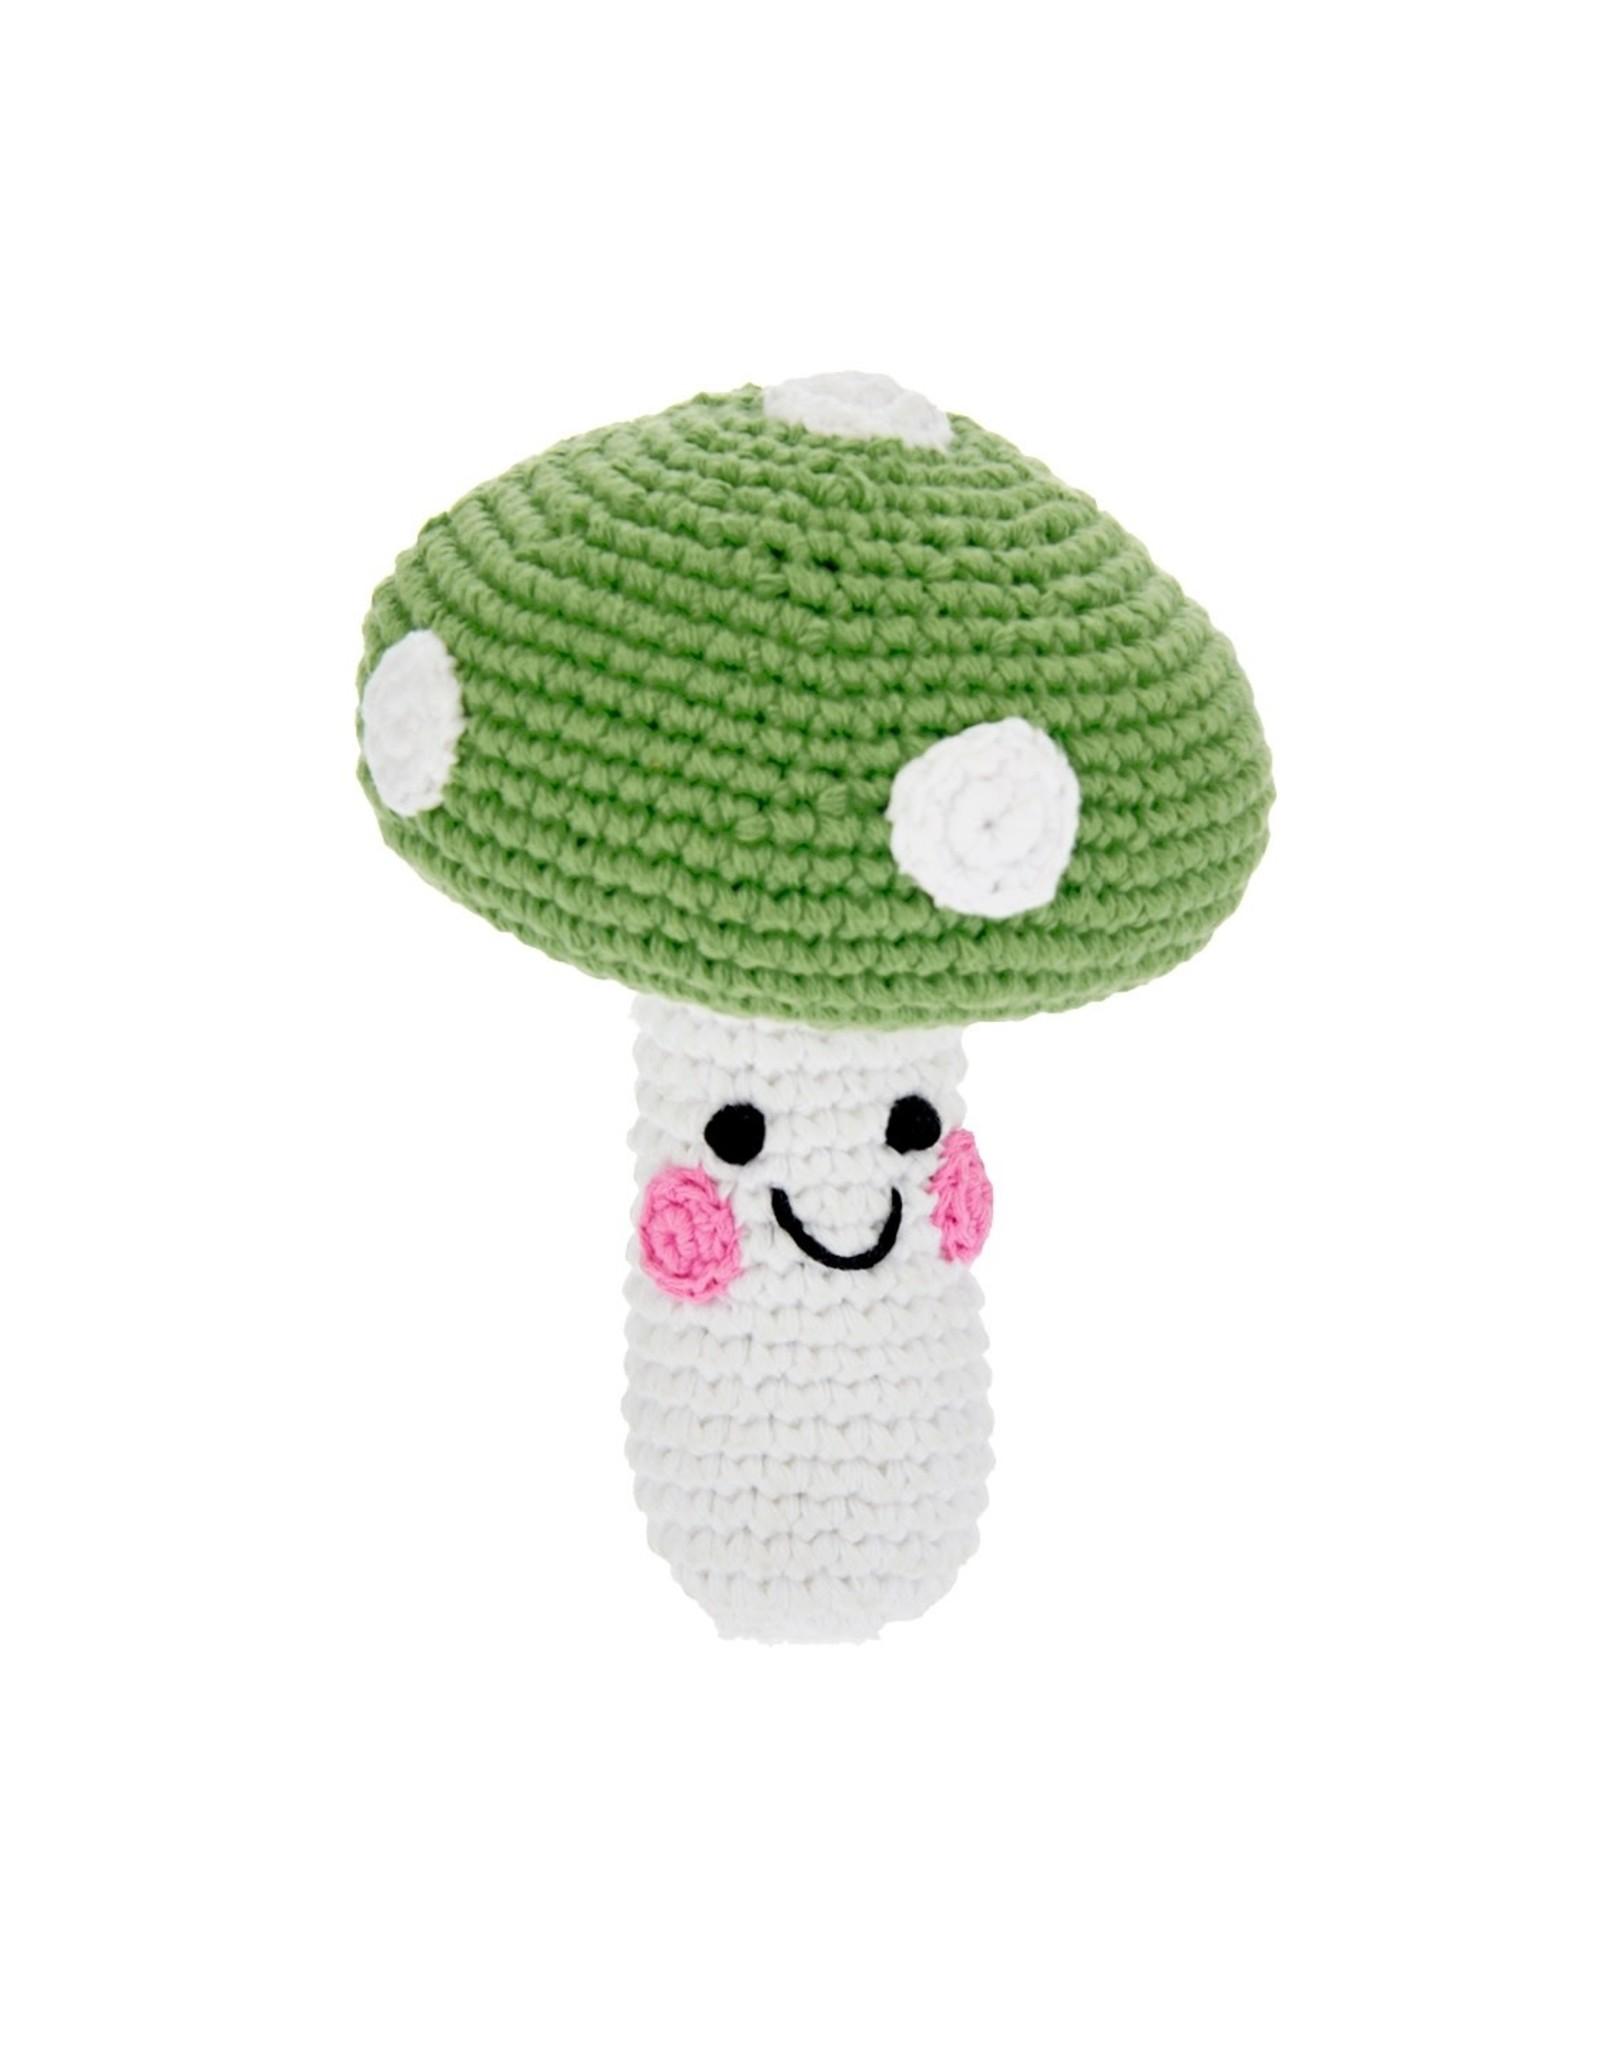 Pebble Friendly Green Mushroom Rattle. Bangladesh